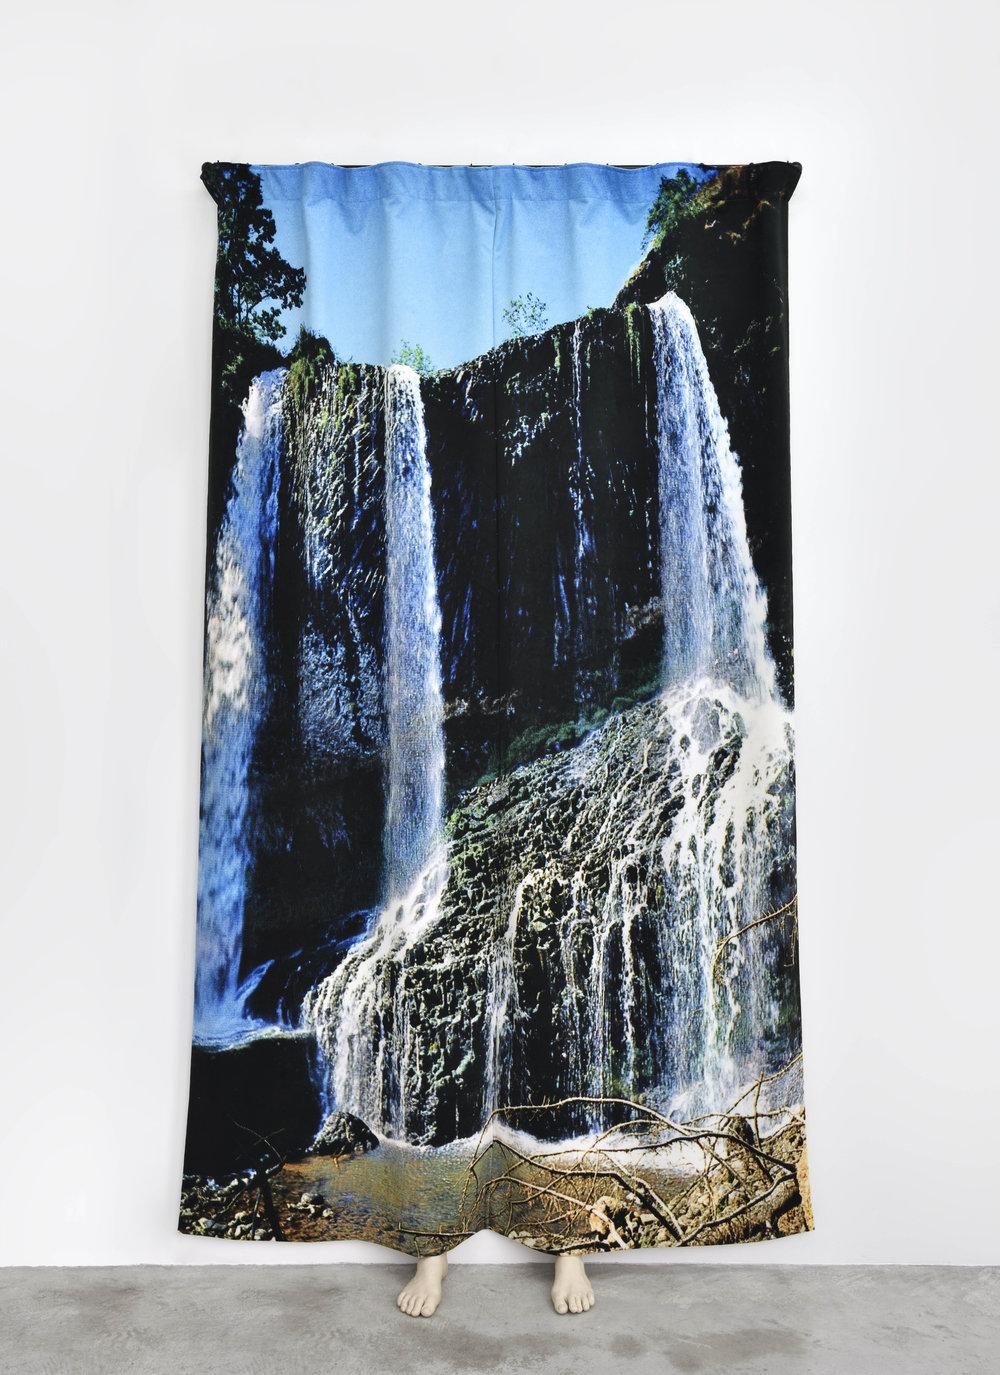 Pierre Ardouvin  La nuit n'est pas finie (cascade) , 2018 print on velvet, rod, fasteners, resin molding 100 13/32 x 47 1/4 x 15 3/4 in (255 x 120 x 40 cm)